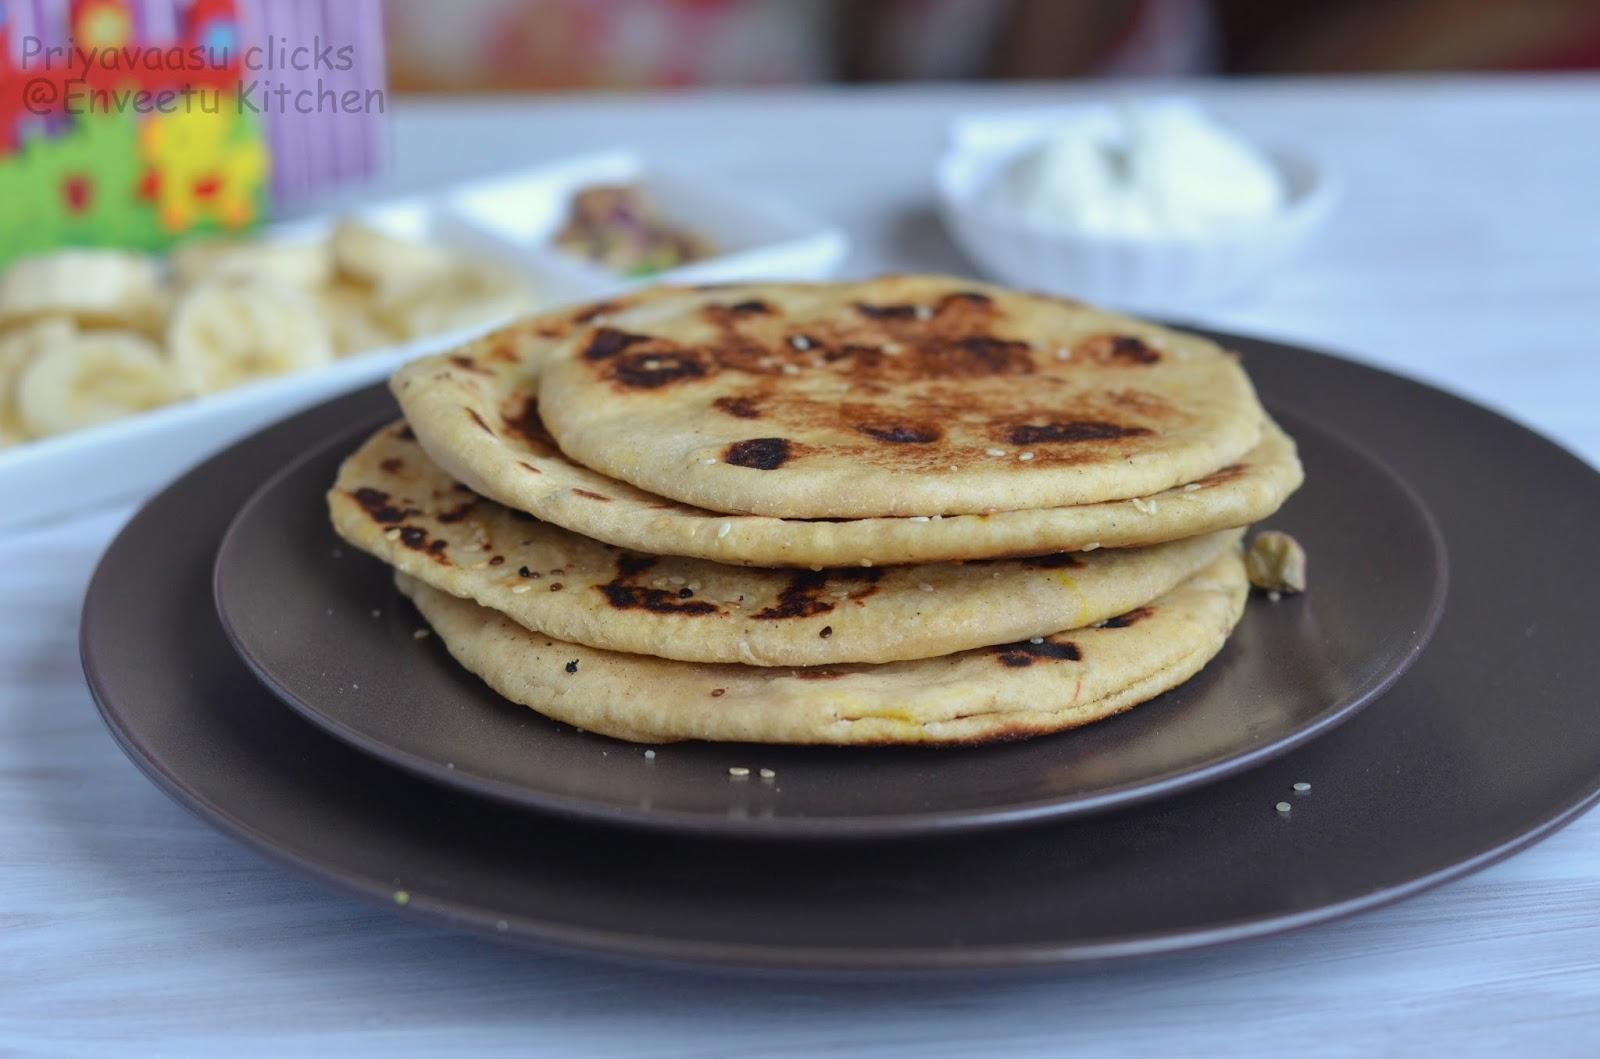 emirati khameer bread/khamir bread from uae